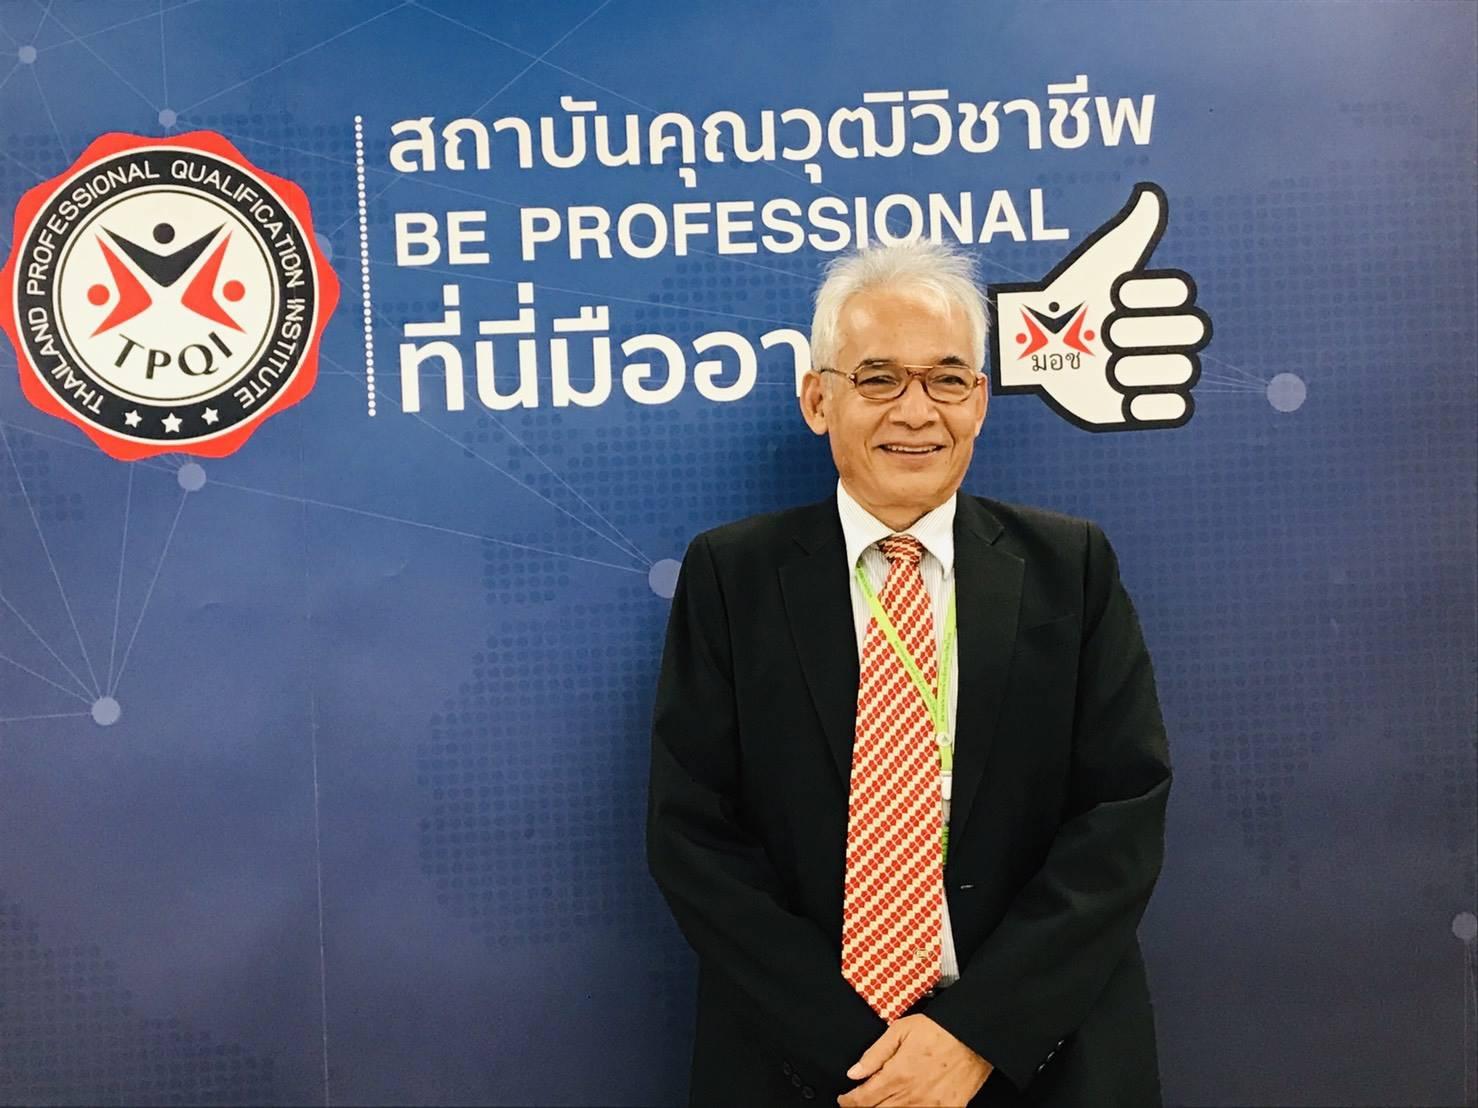 TREBAผนึก 2 พันธมิตร ยกระดับนายหน้าไทยขึ้นแท่นมืออาชีพเทียบสากล | Prop2Morrow บ้าน คอนโด ข่าวอสังหาฯ